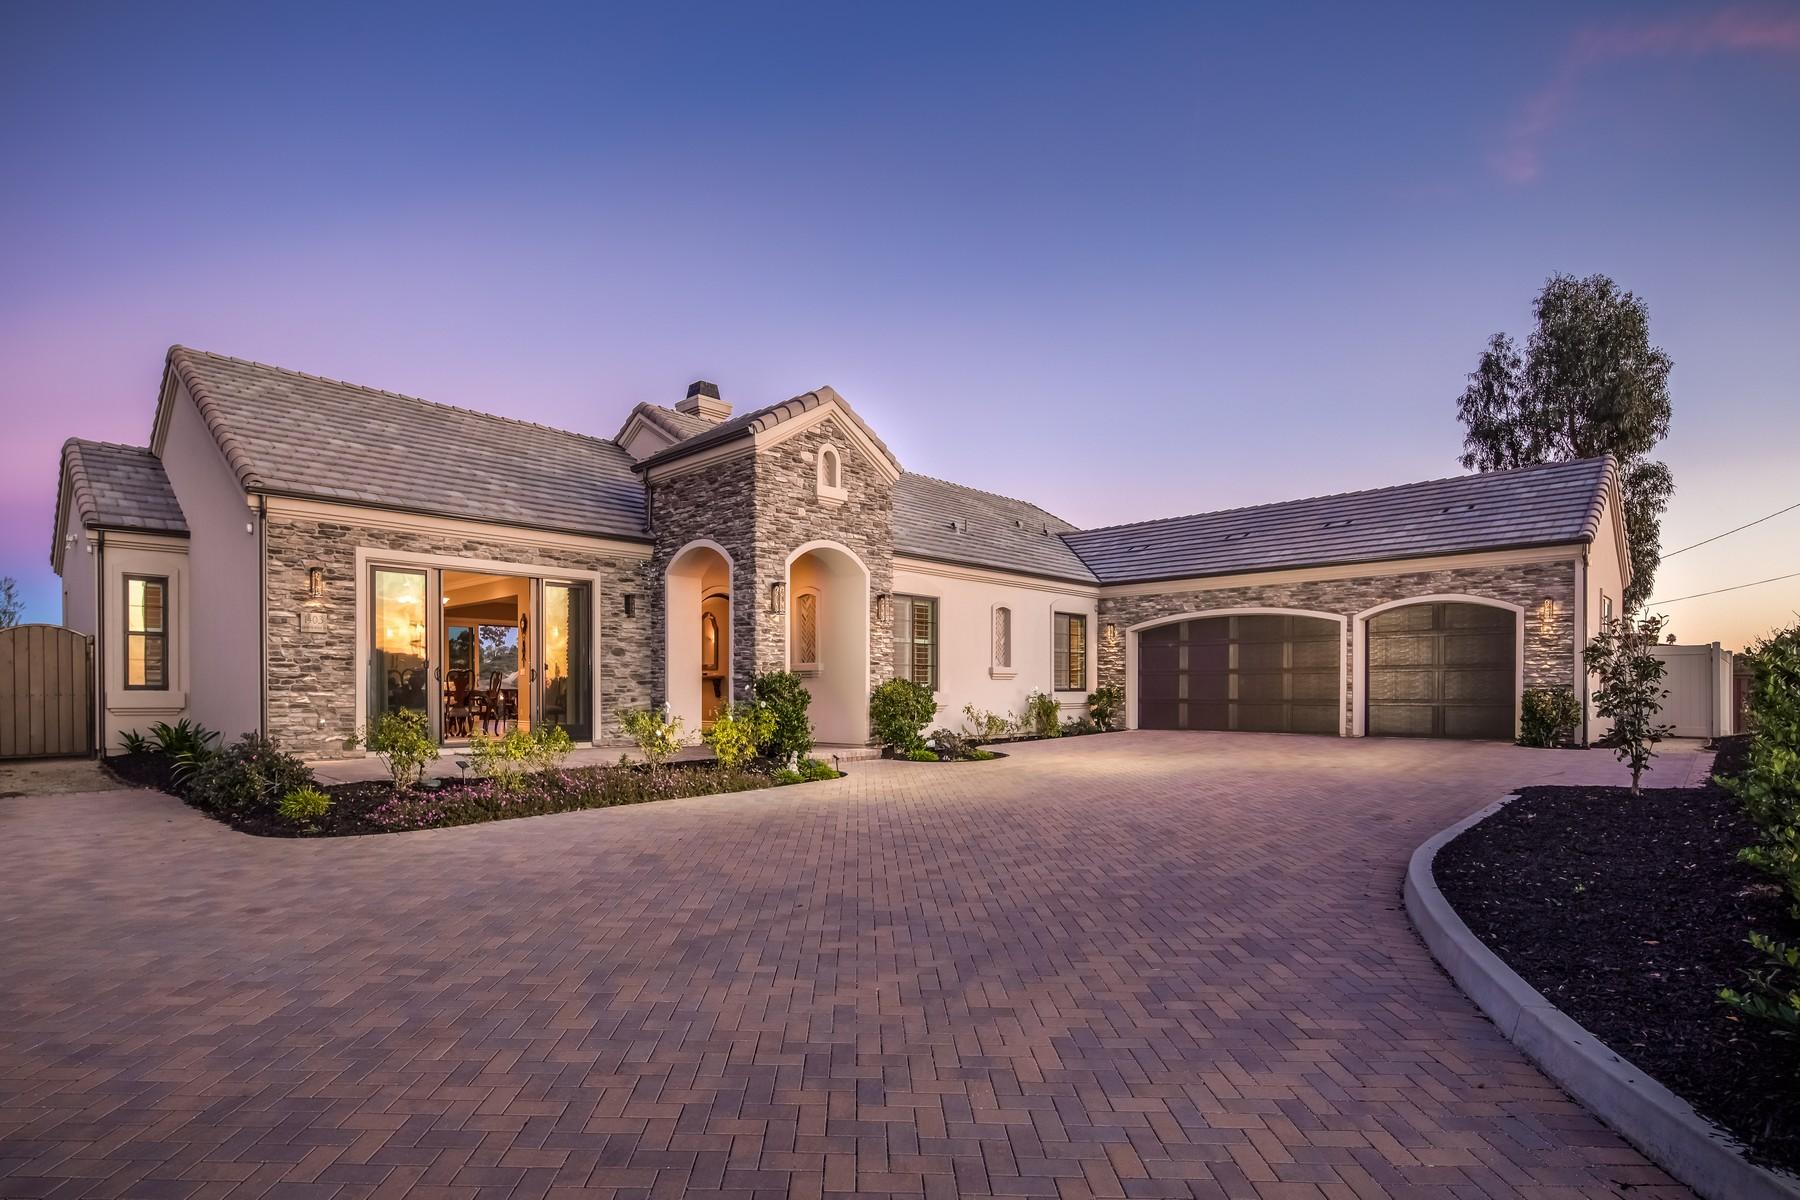 Single Family Homes for Sale at 1403 Rainbow Ridge Lane Encinitas, California 92024 United States